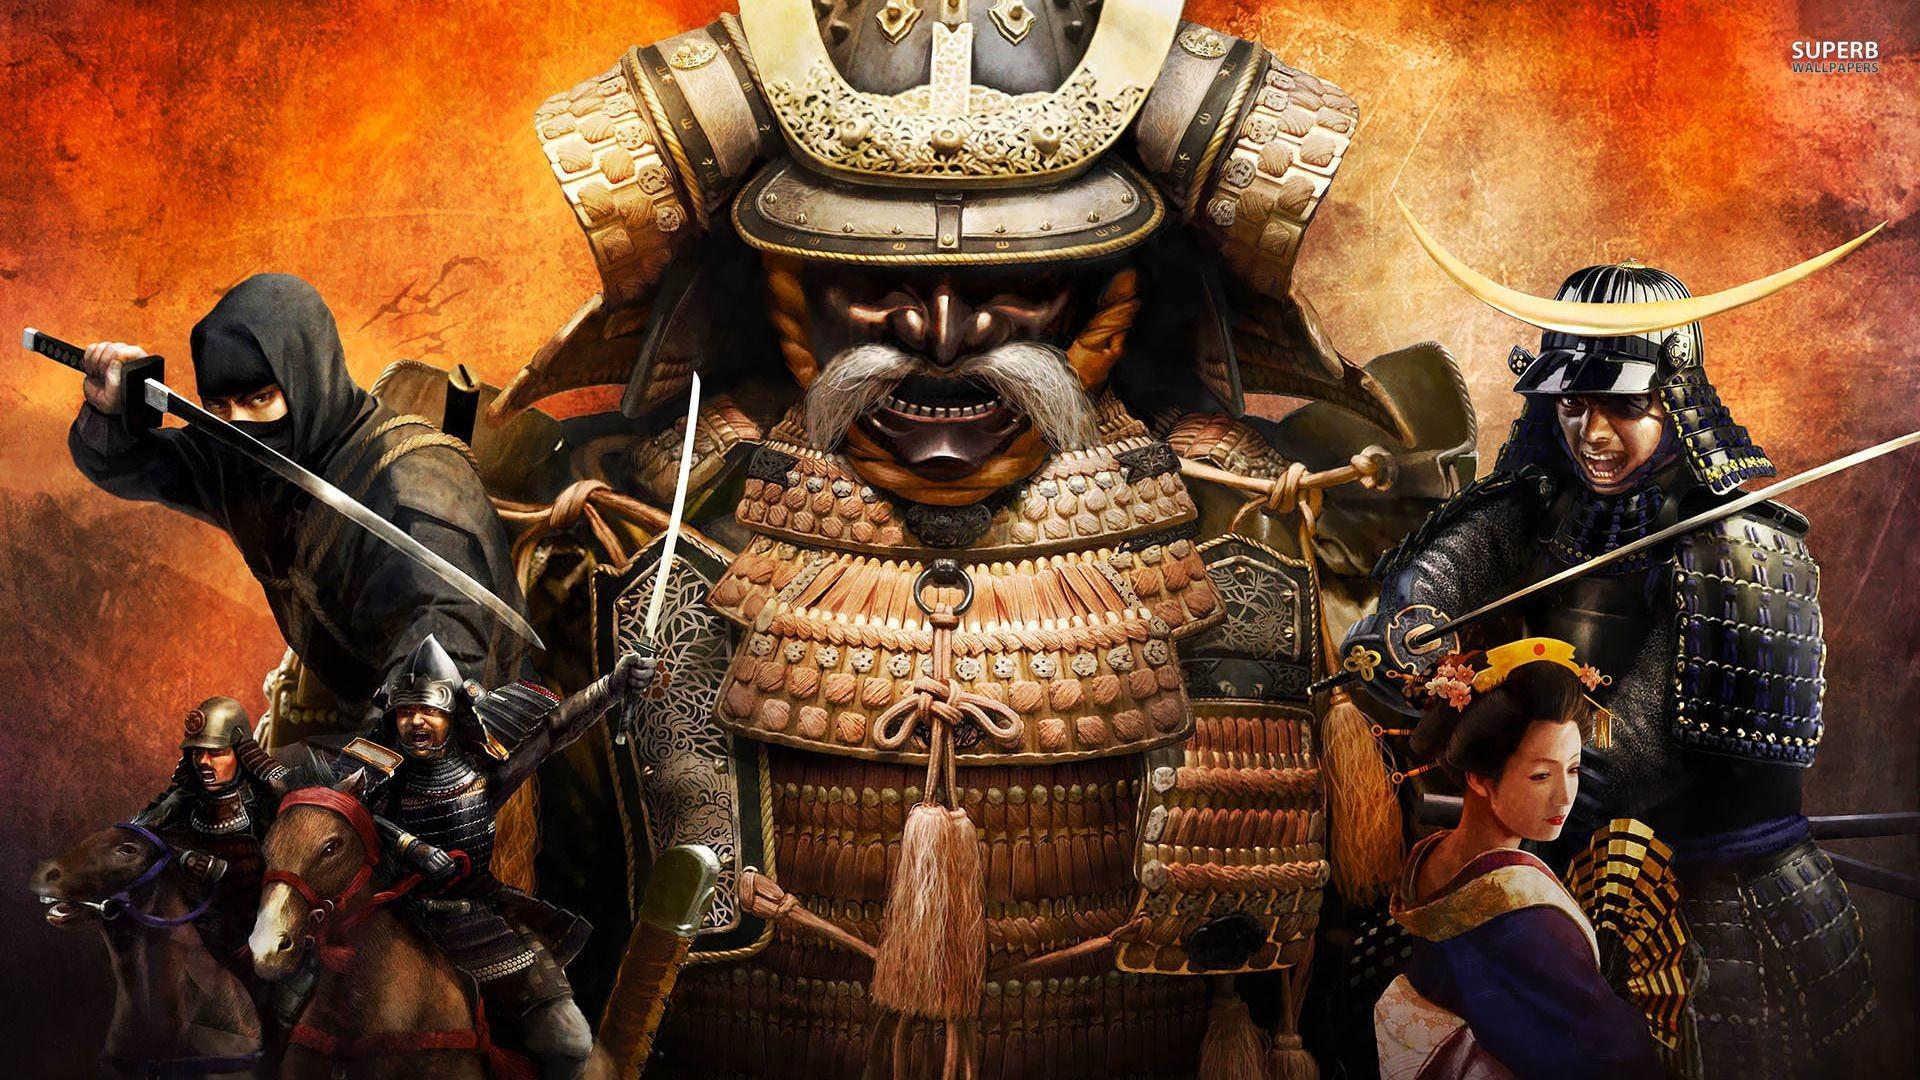 Total War: Shogun 2 wallpaper – Game wallpapers – #19003